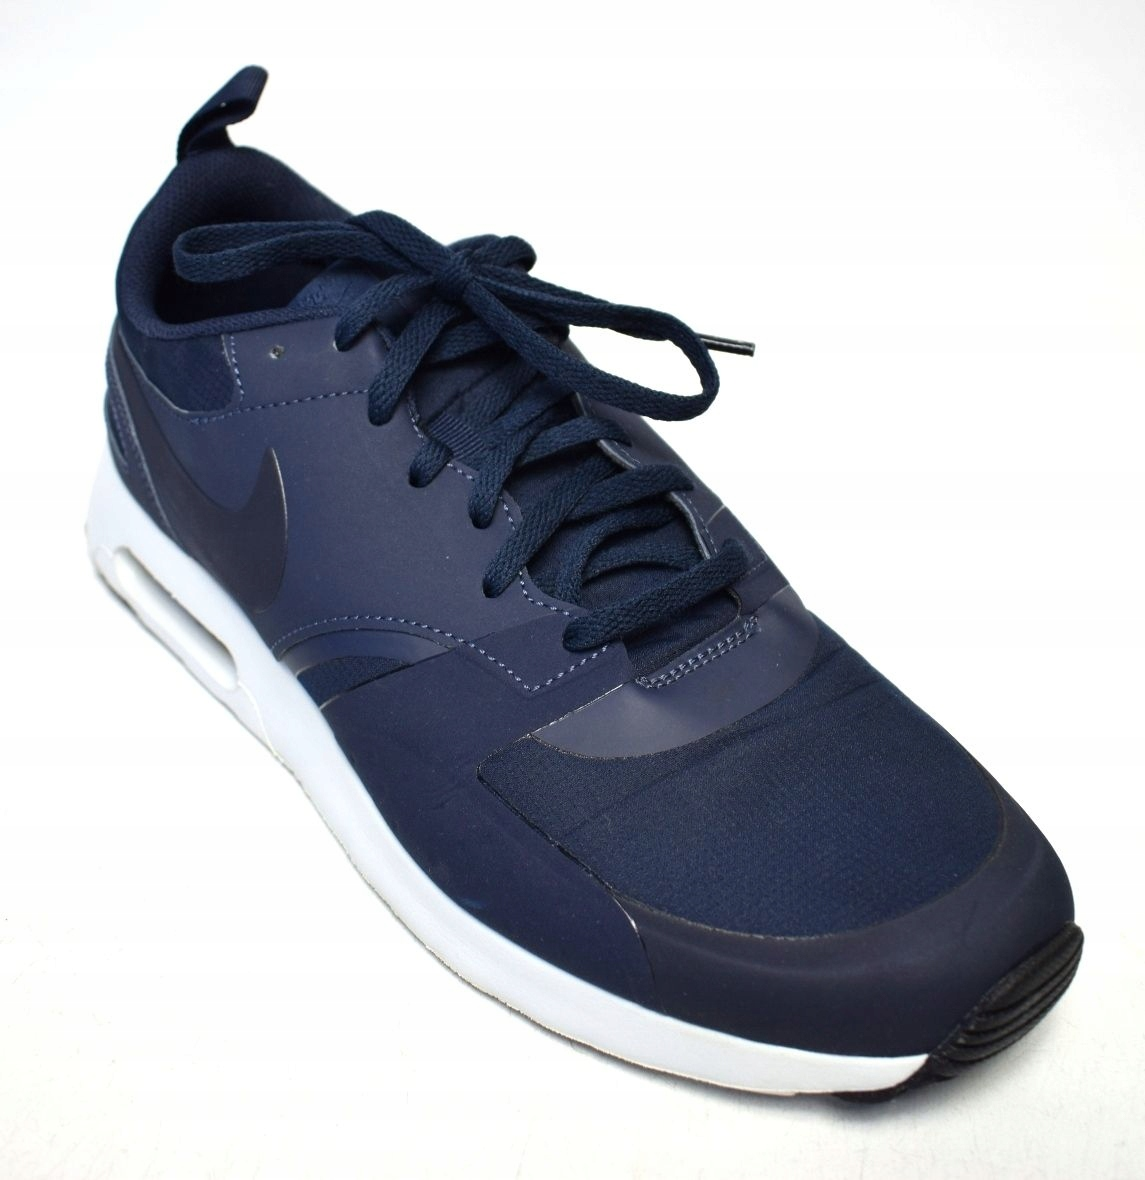 official photos 8ee19 9a884 Nike AIR MAX VISION PRM BUTY SPORTOWE męskie 44 (7583787018)